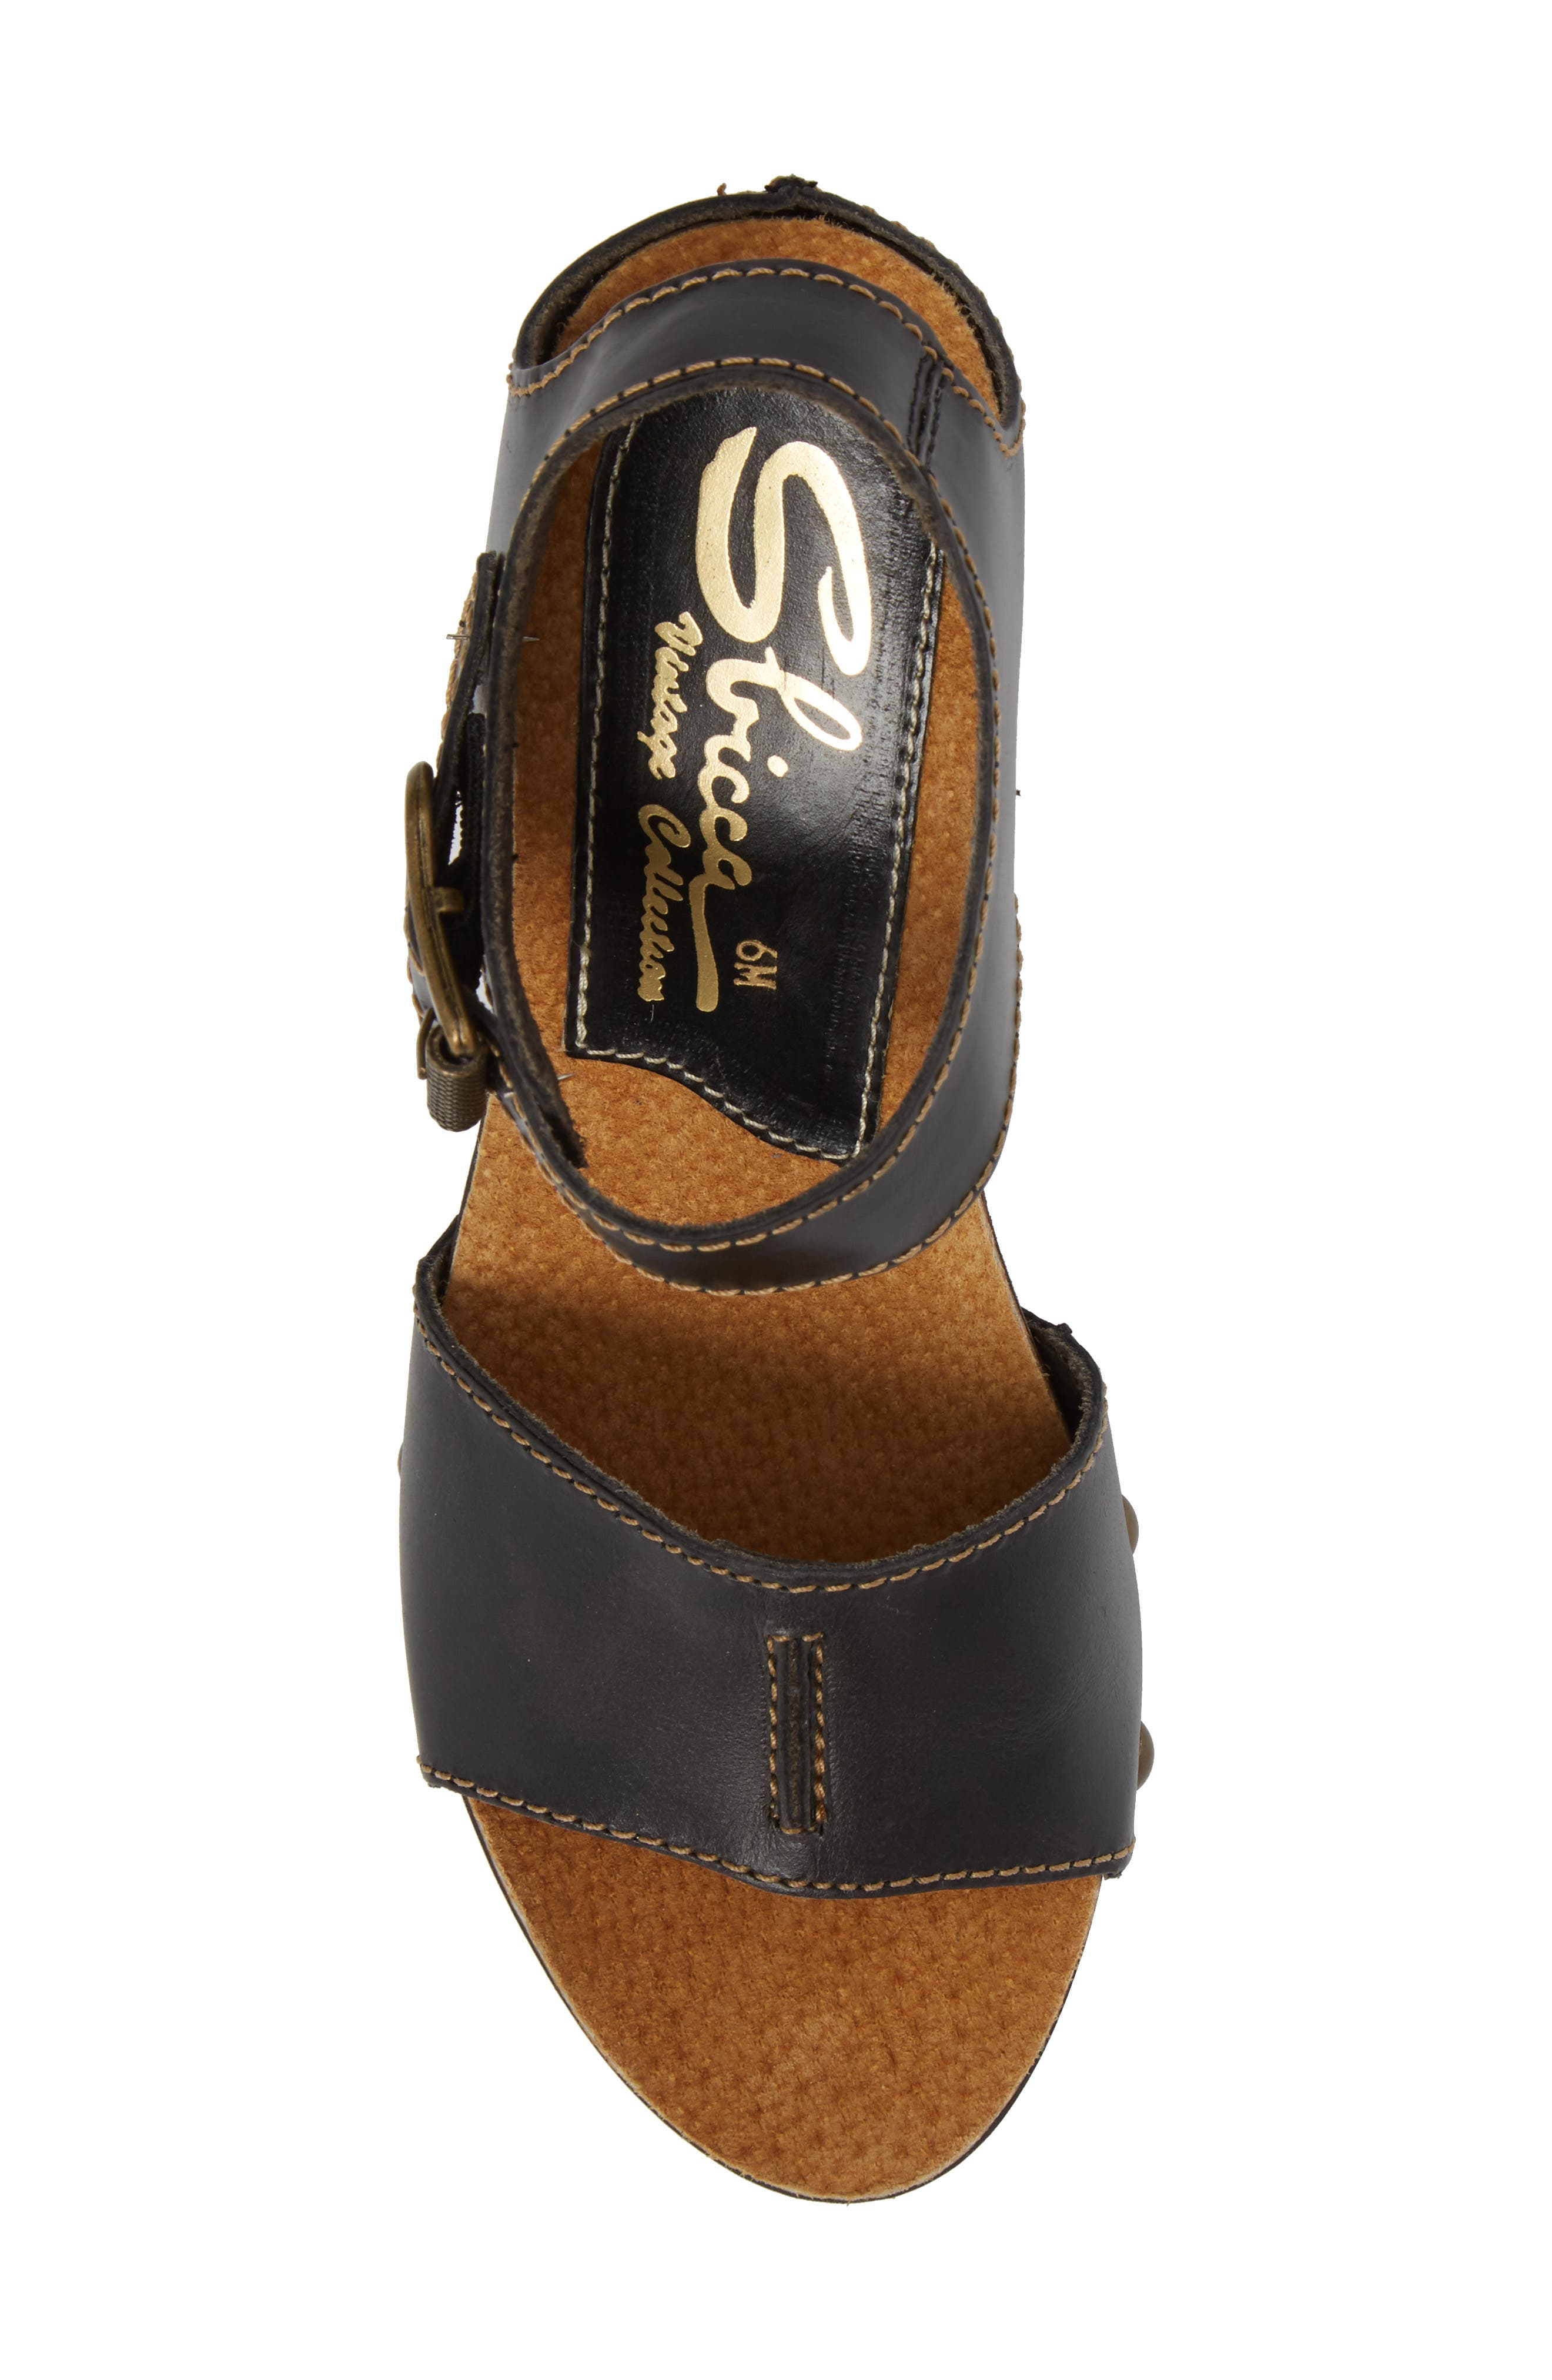 Brella Studded Platform Wedge Sandal,                             Alternate thumbnail 5, color,                             BLACK